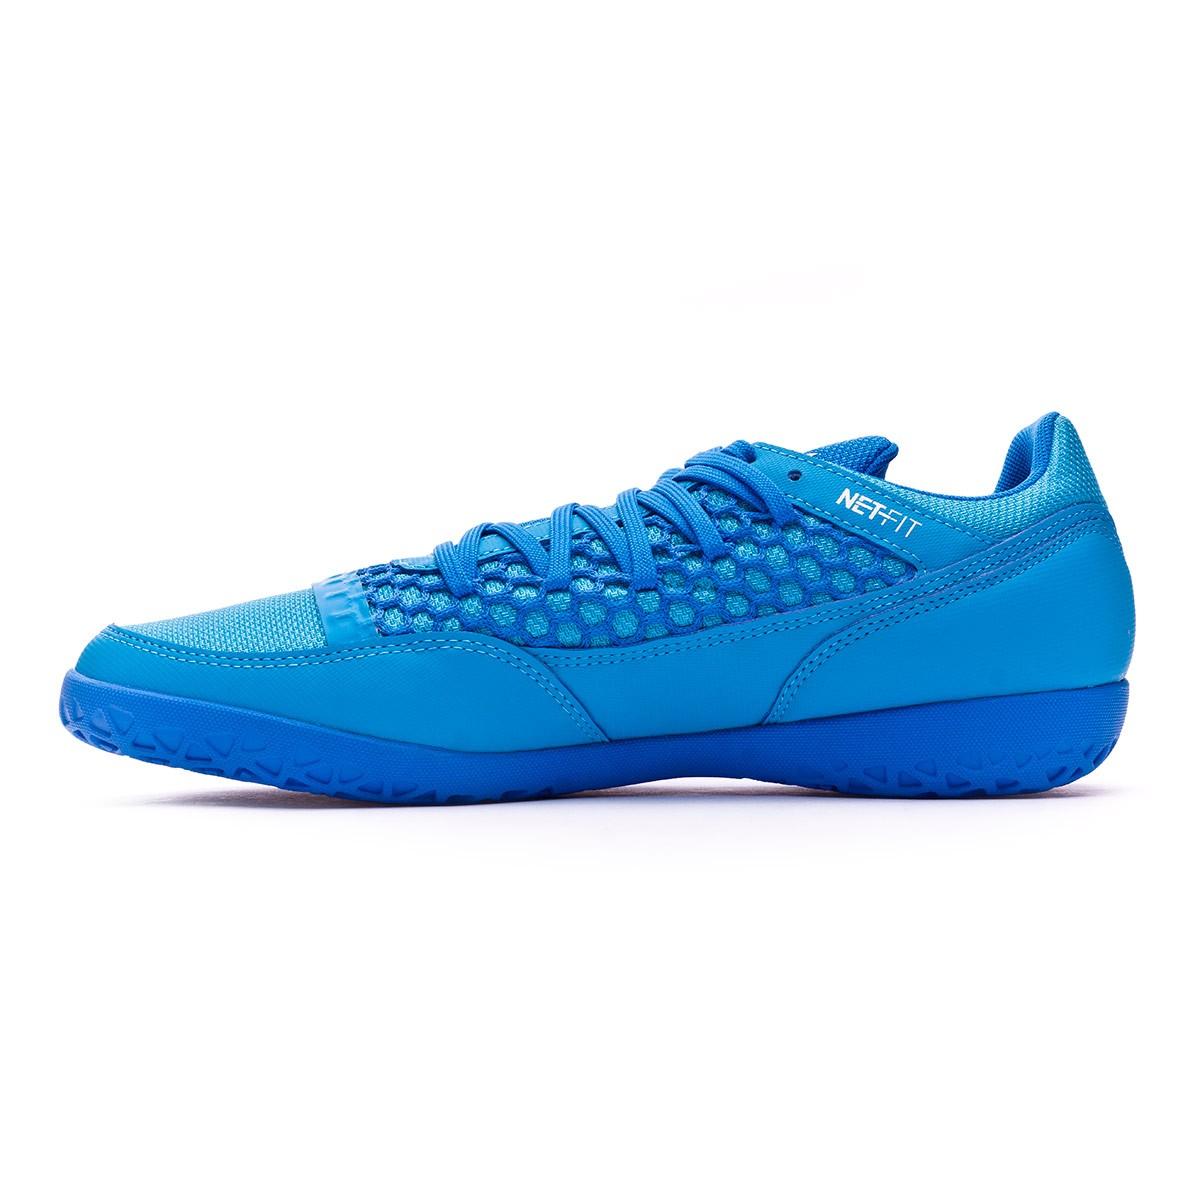 Futsal Boot Puma 365 NF CT Electric Blue Lemonade-Puma White-Hawaiian Oc -  Football store Fútbol Emotion c259c20e6